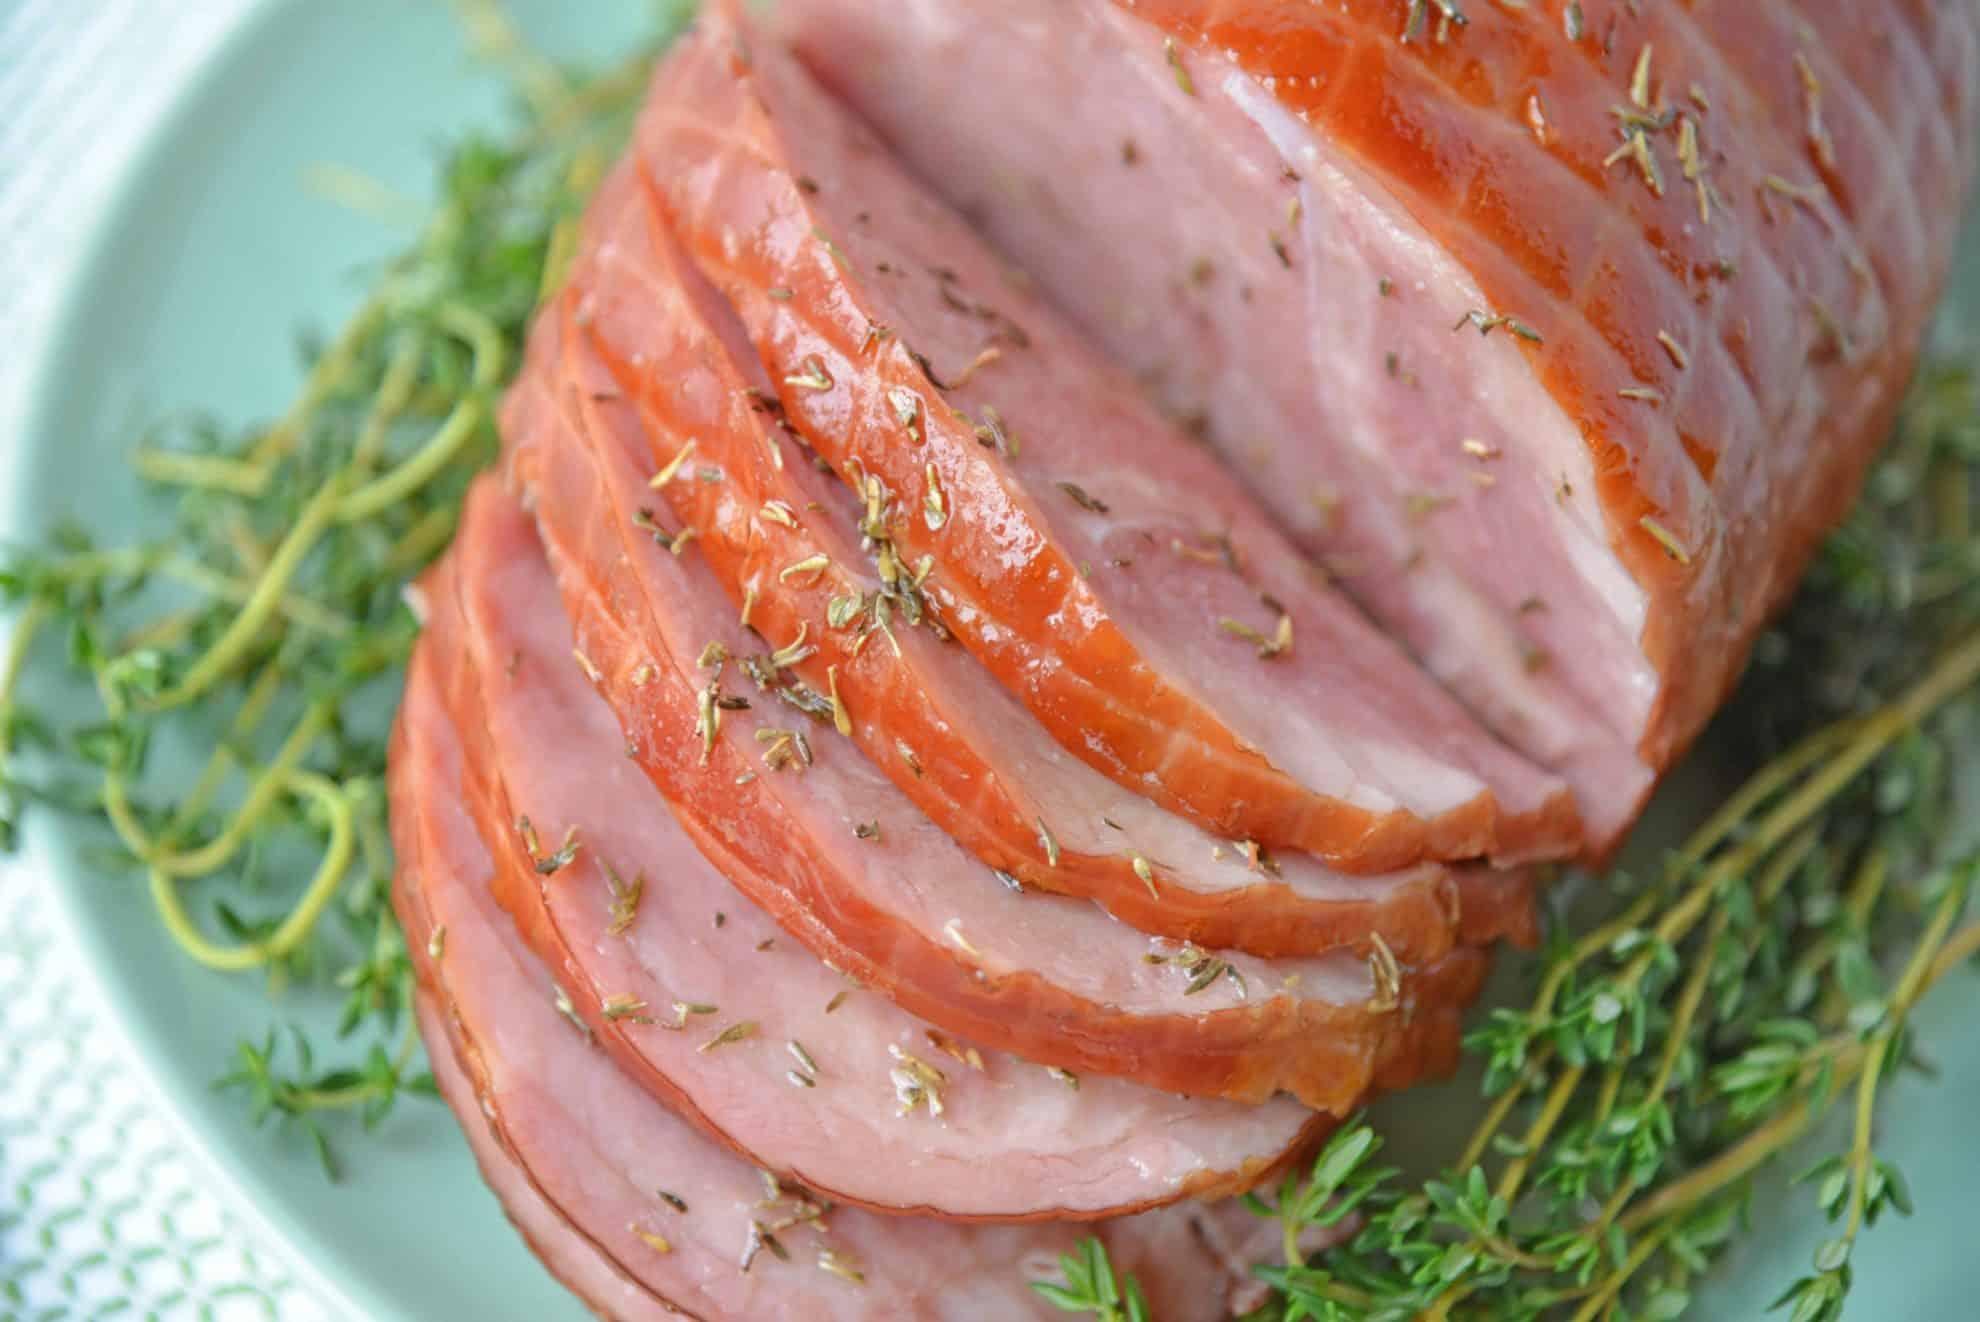 Angle view of sliced glazed ham